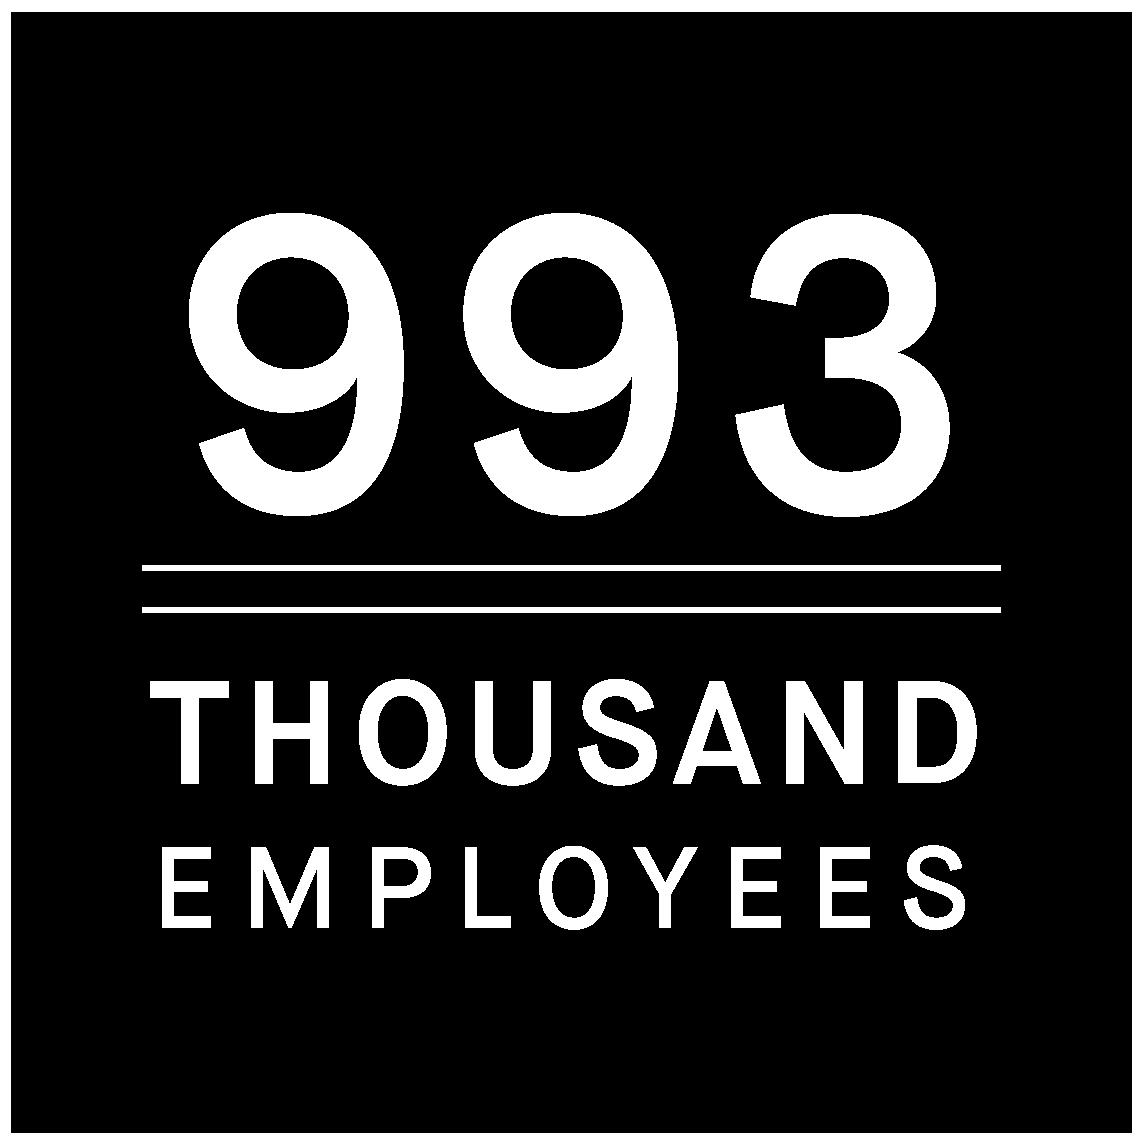 993,000 employees